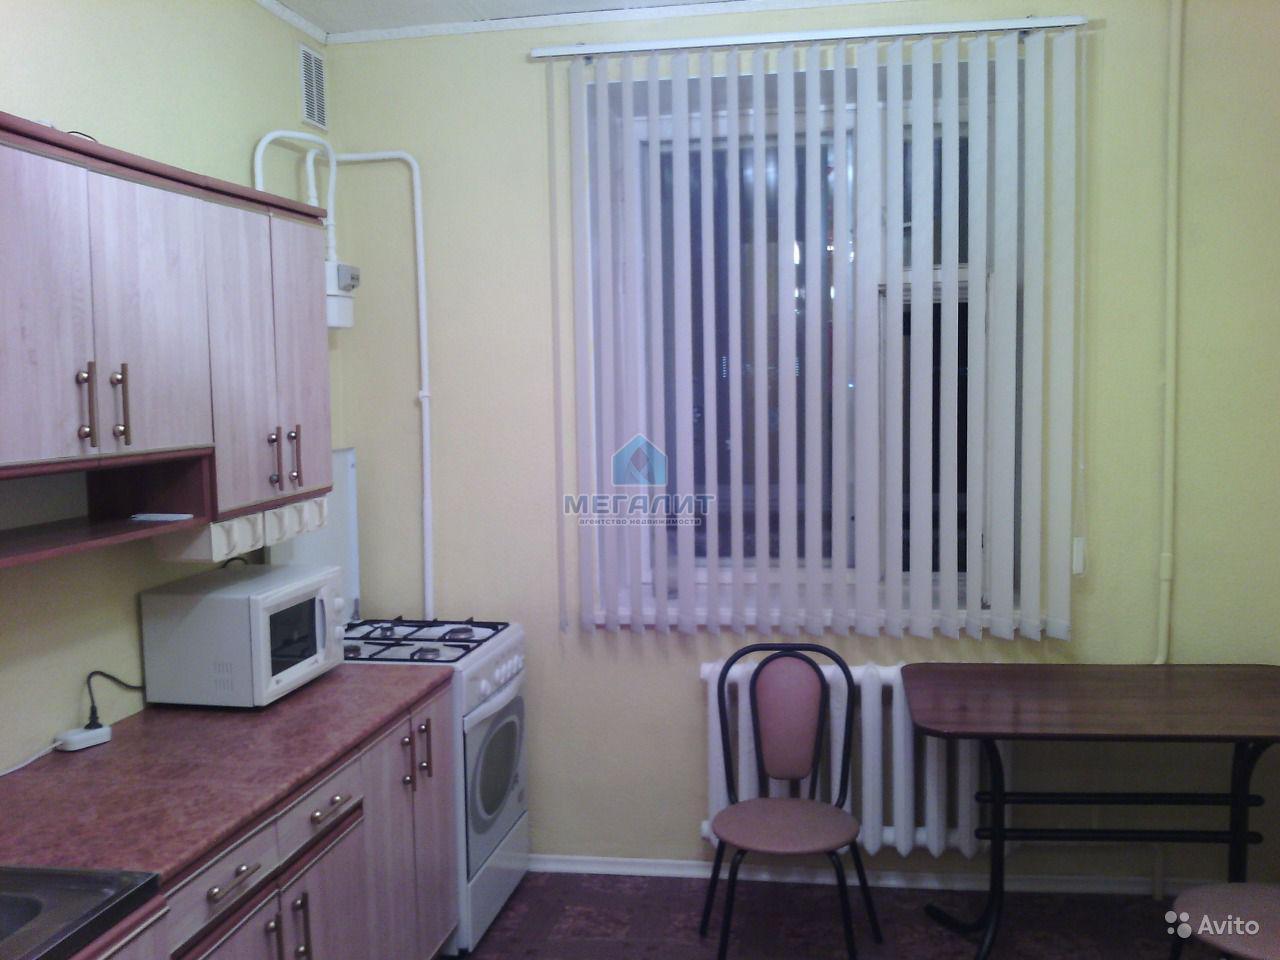 Аренда 1-к квартиры Братьев Касимовых 6А, 45 м² (миниатюра №2)